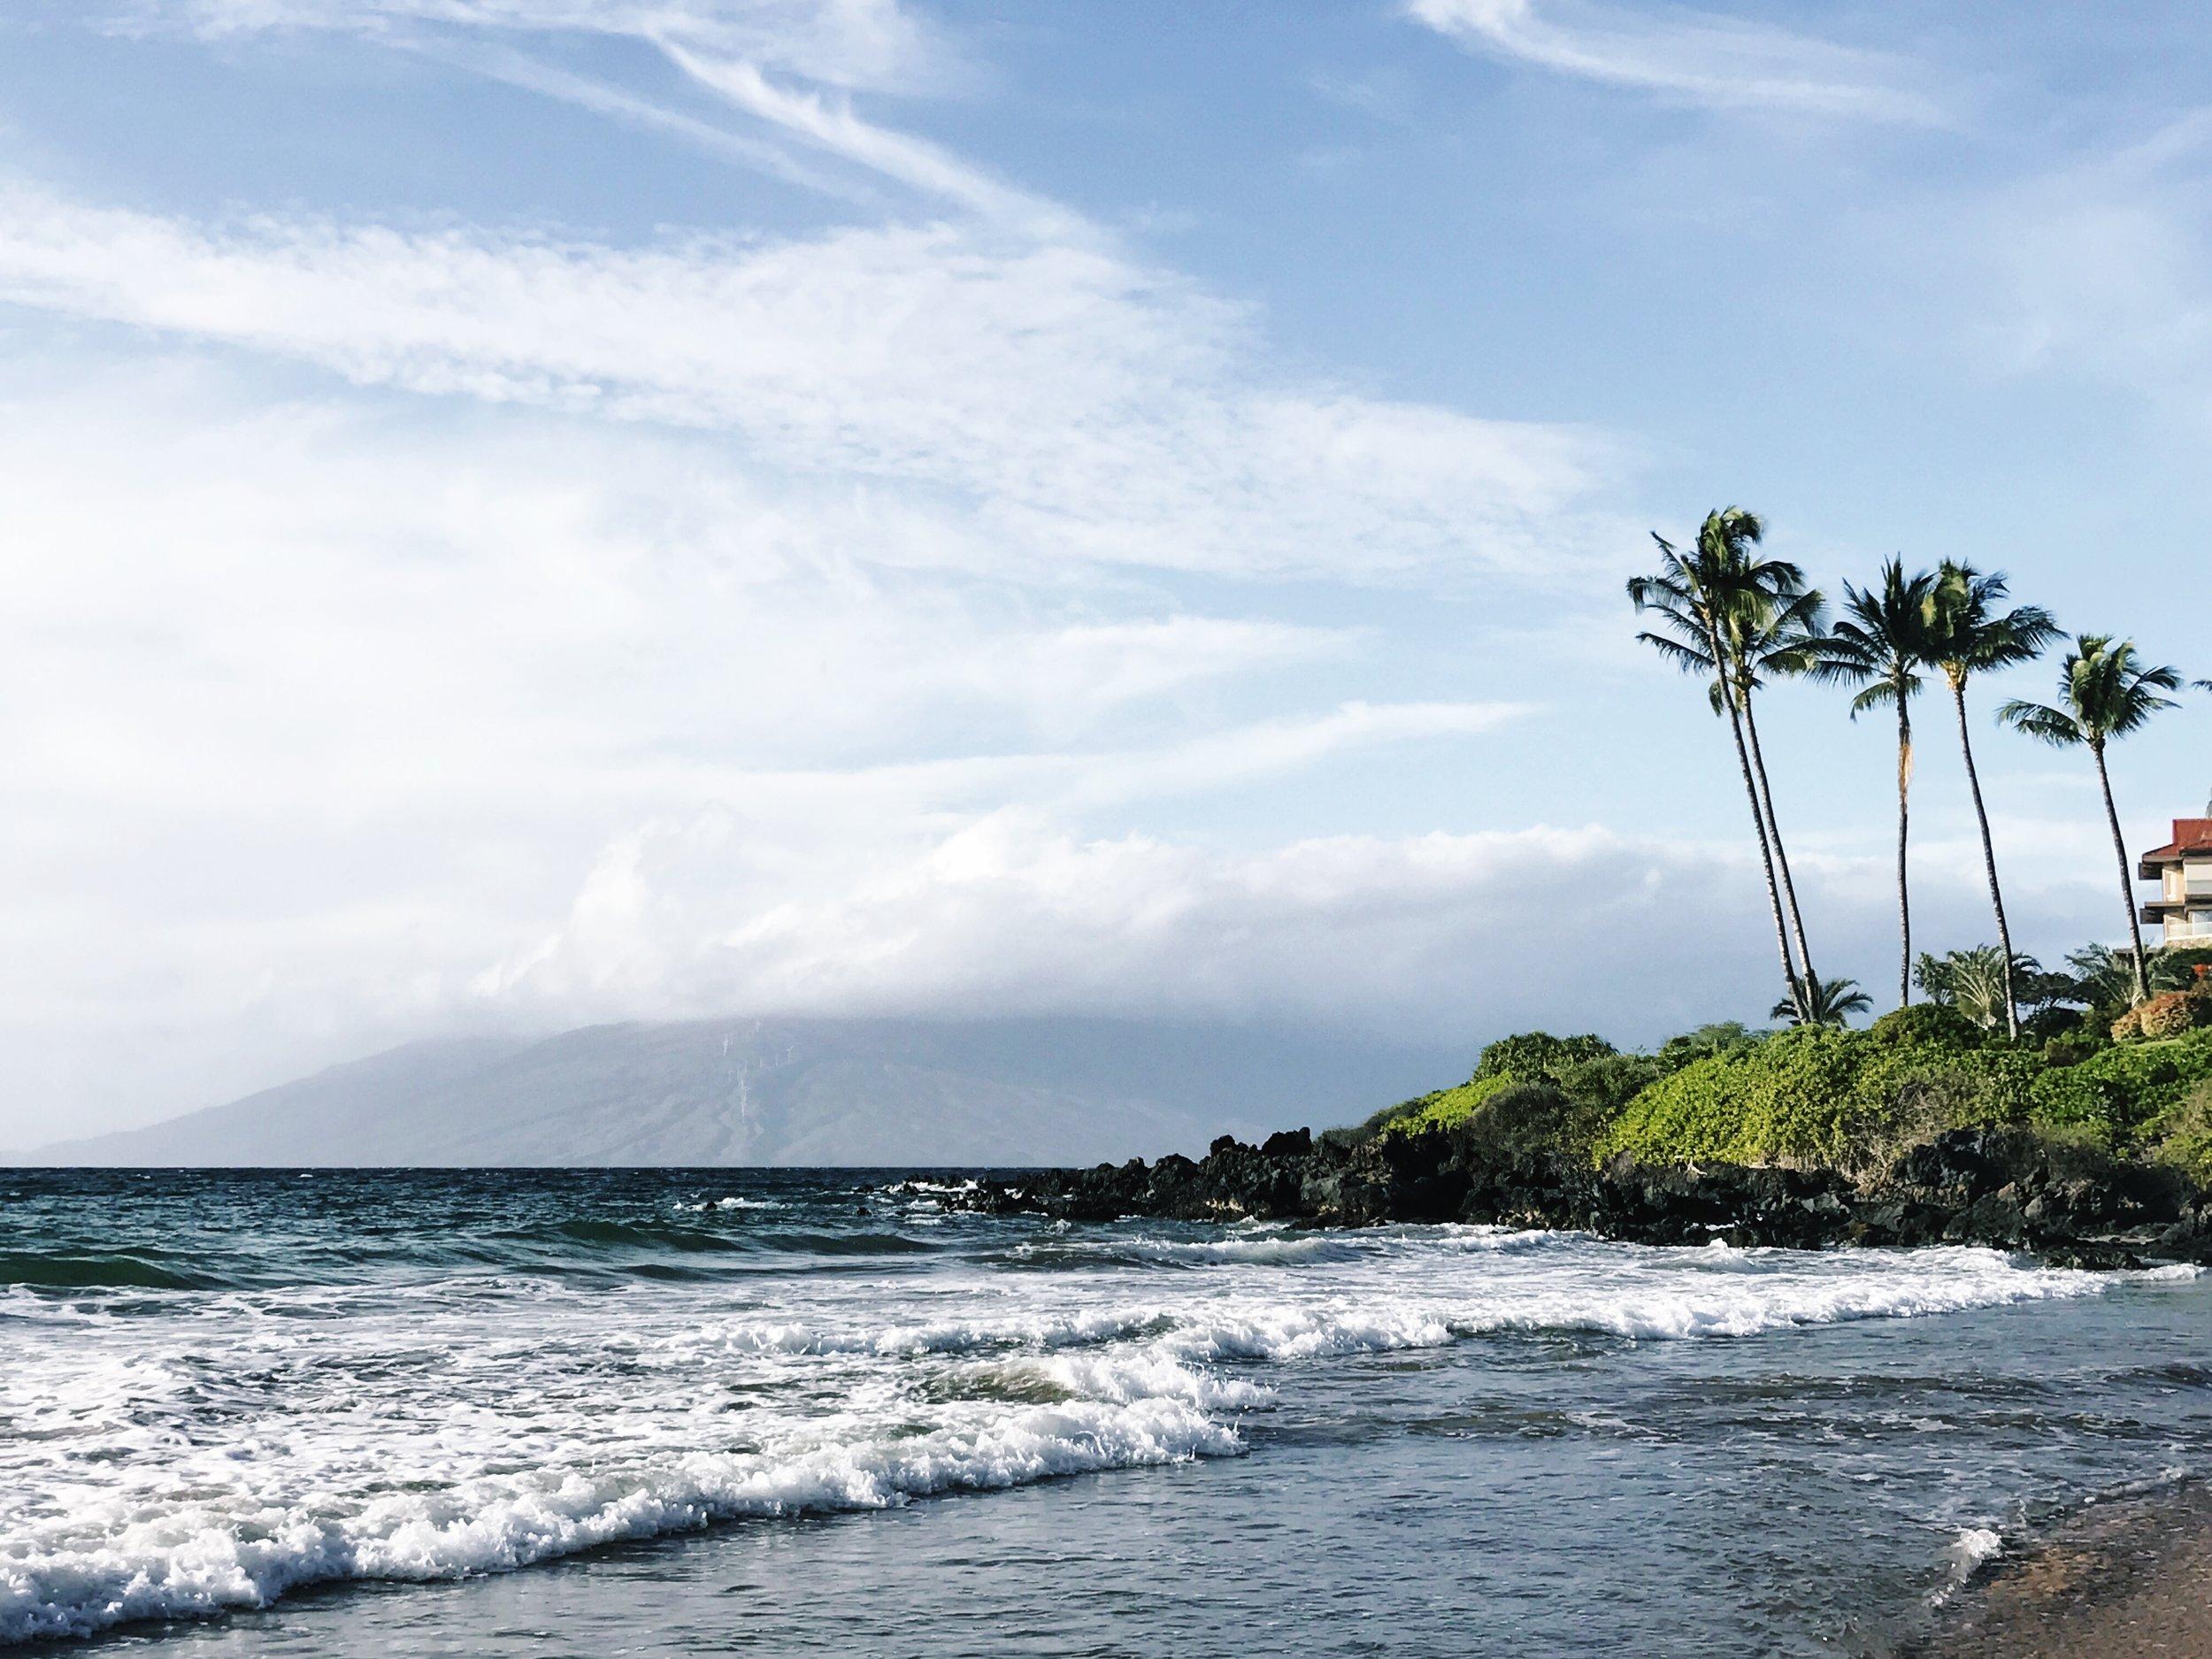 polo beach maui things to do vacation island explore